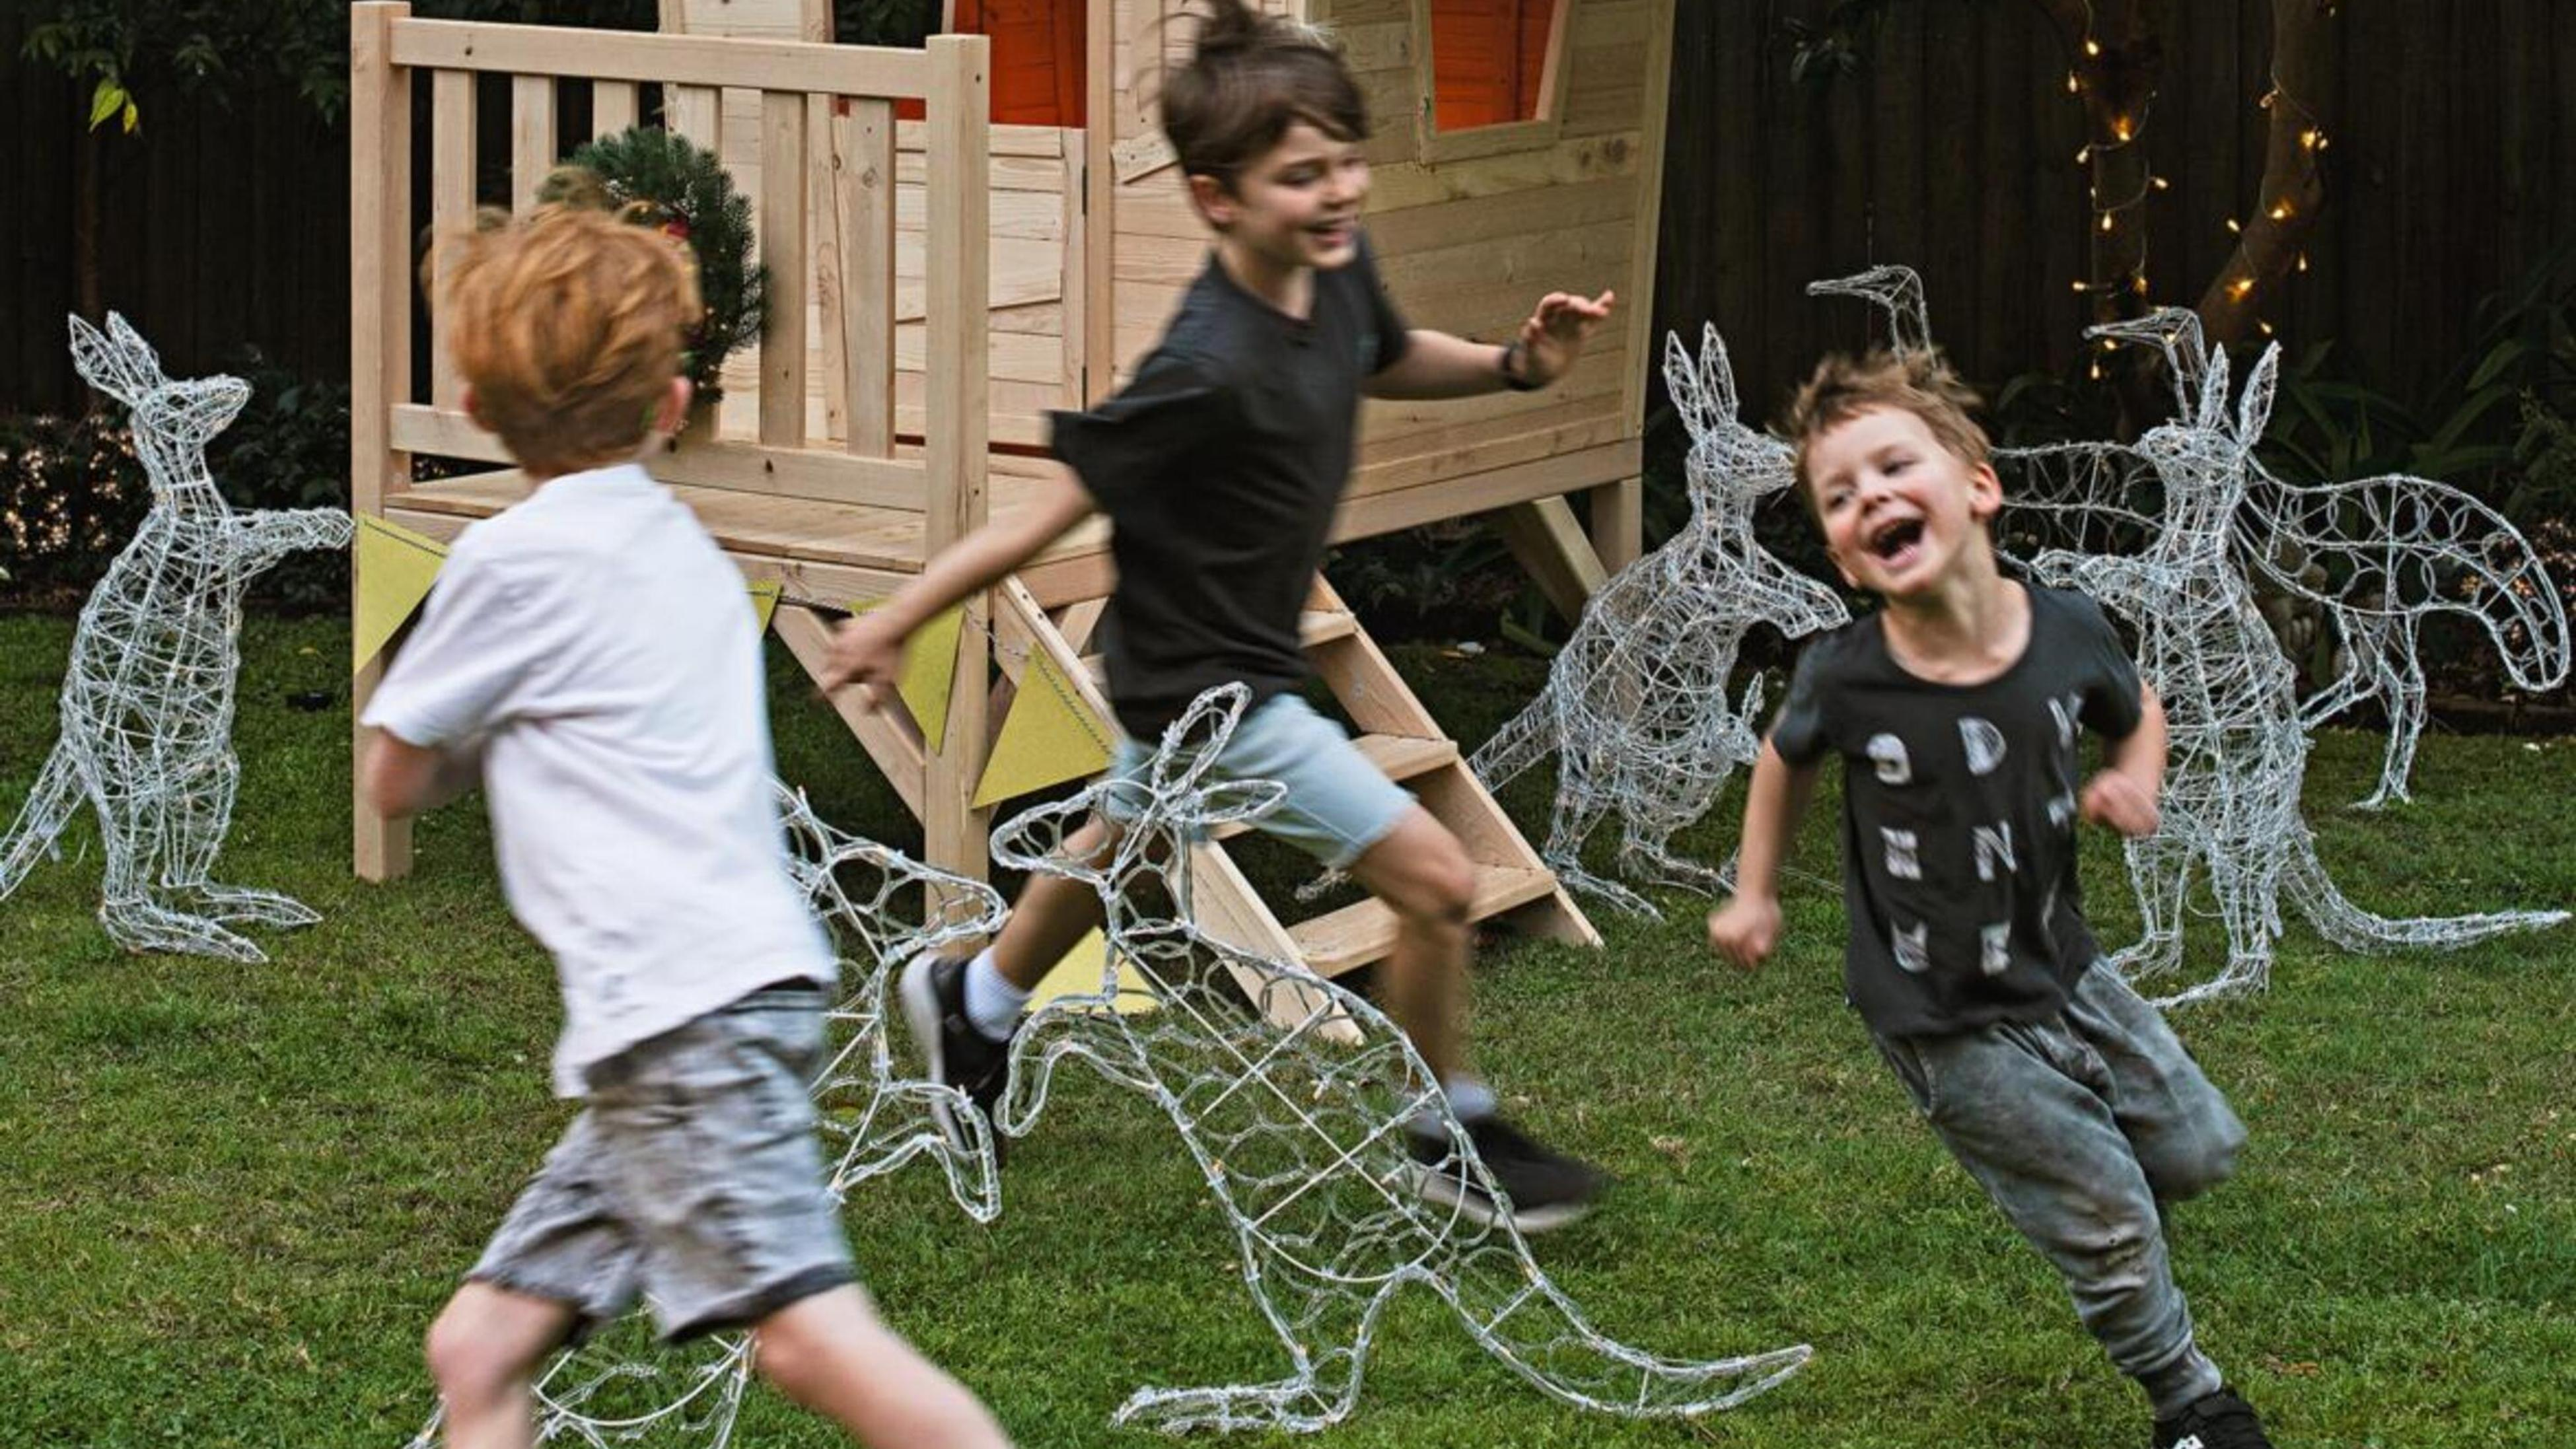 Children running around solar statues in the shape of animals.